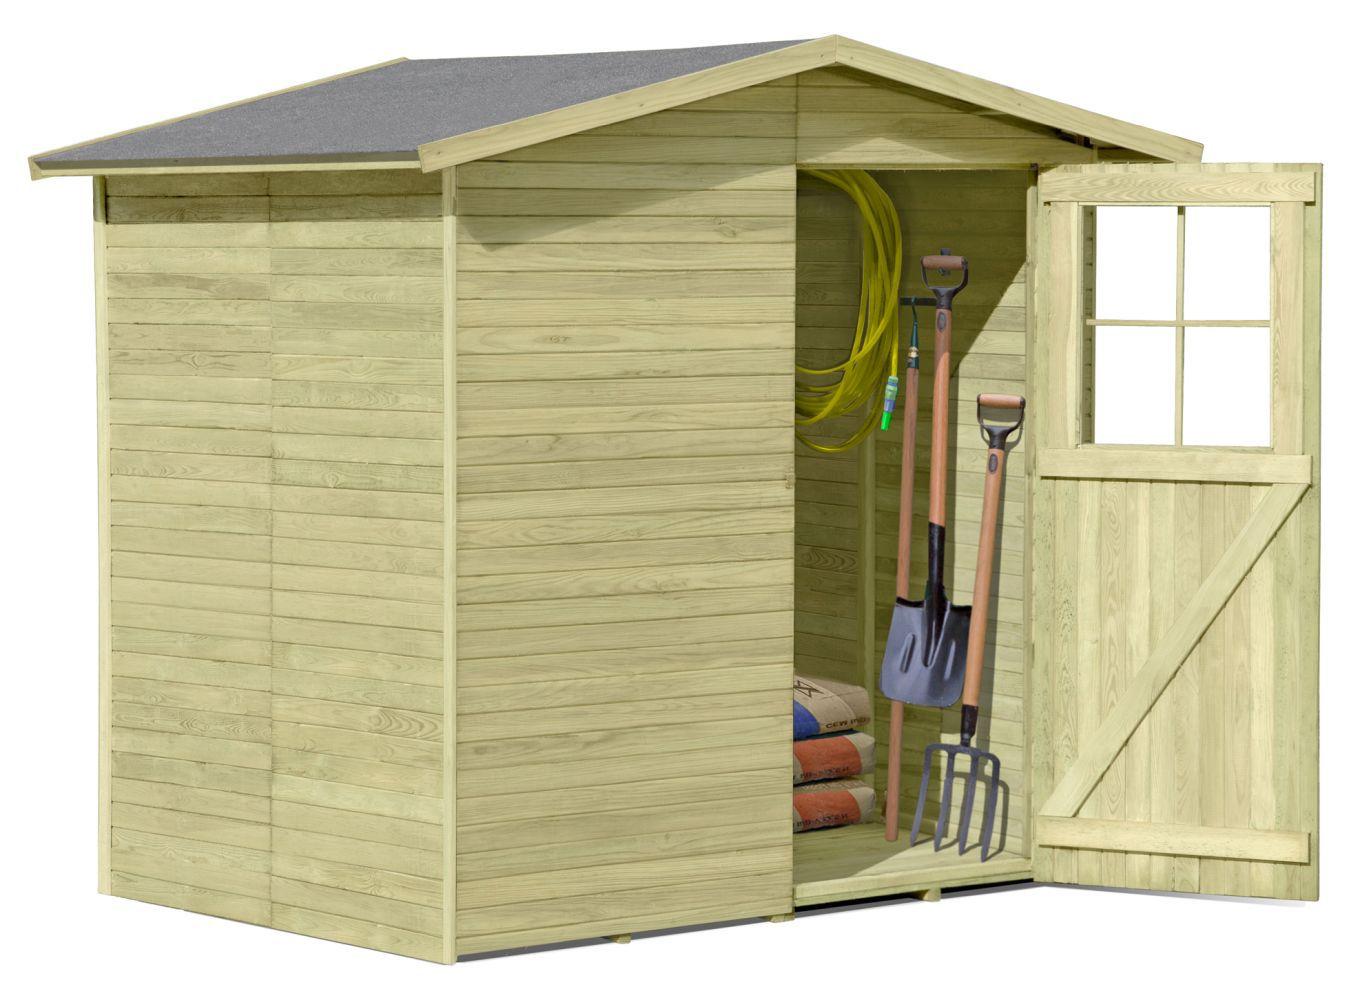 Gerätehaus 05, aus Kiefernholz, FSC® - Außenmaße: 200 x 165 x 210 cm (L x B x H)